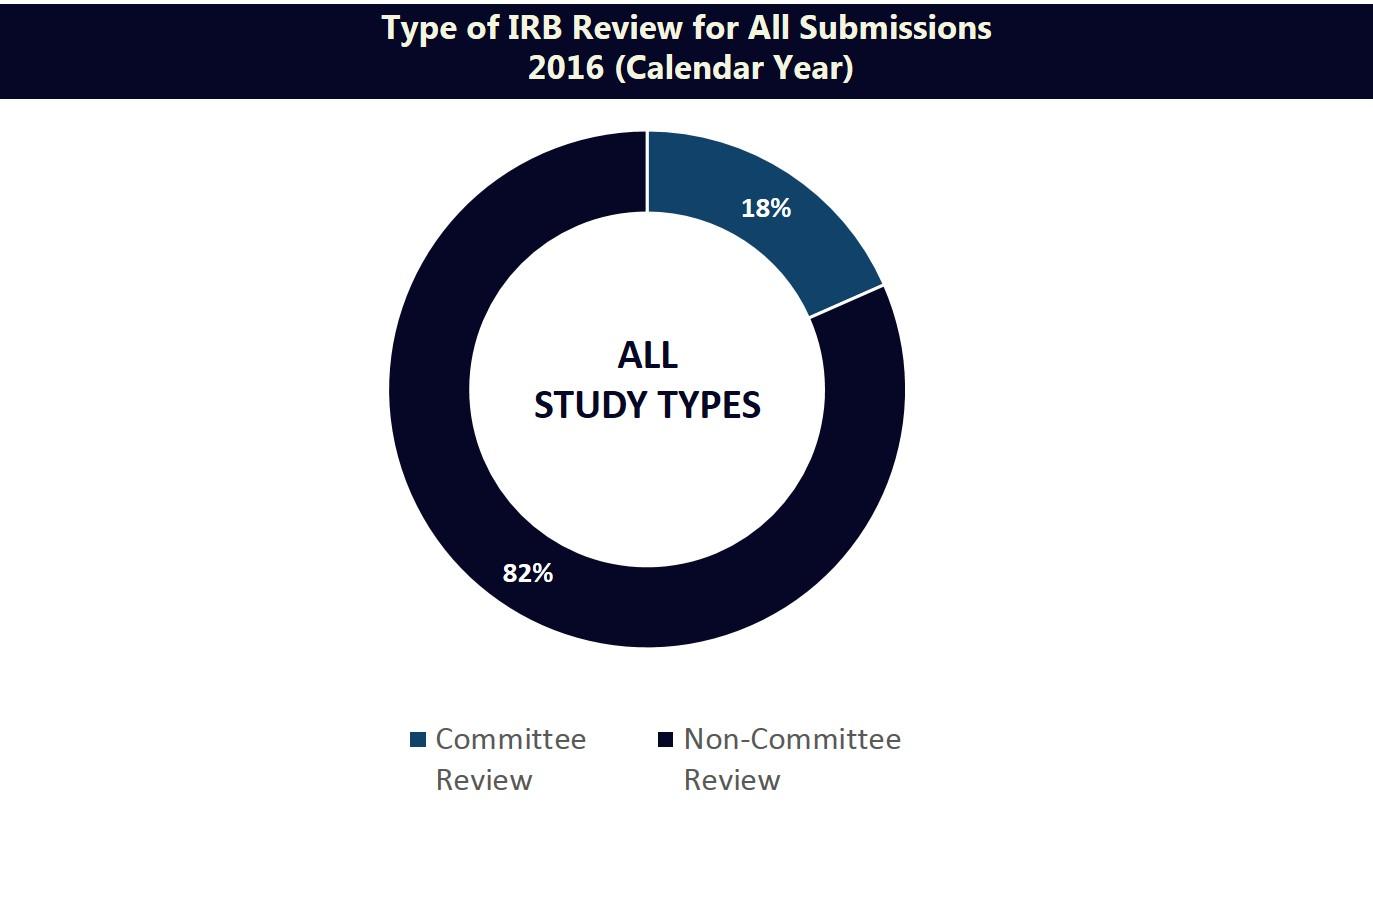 Description of study types - contact hrpp@umn.edu for information